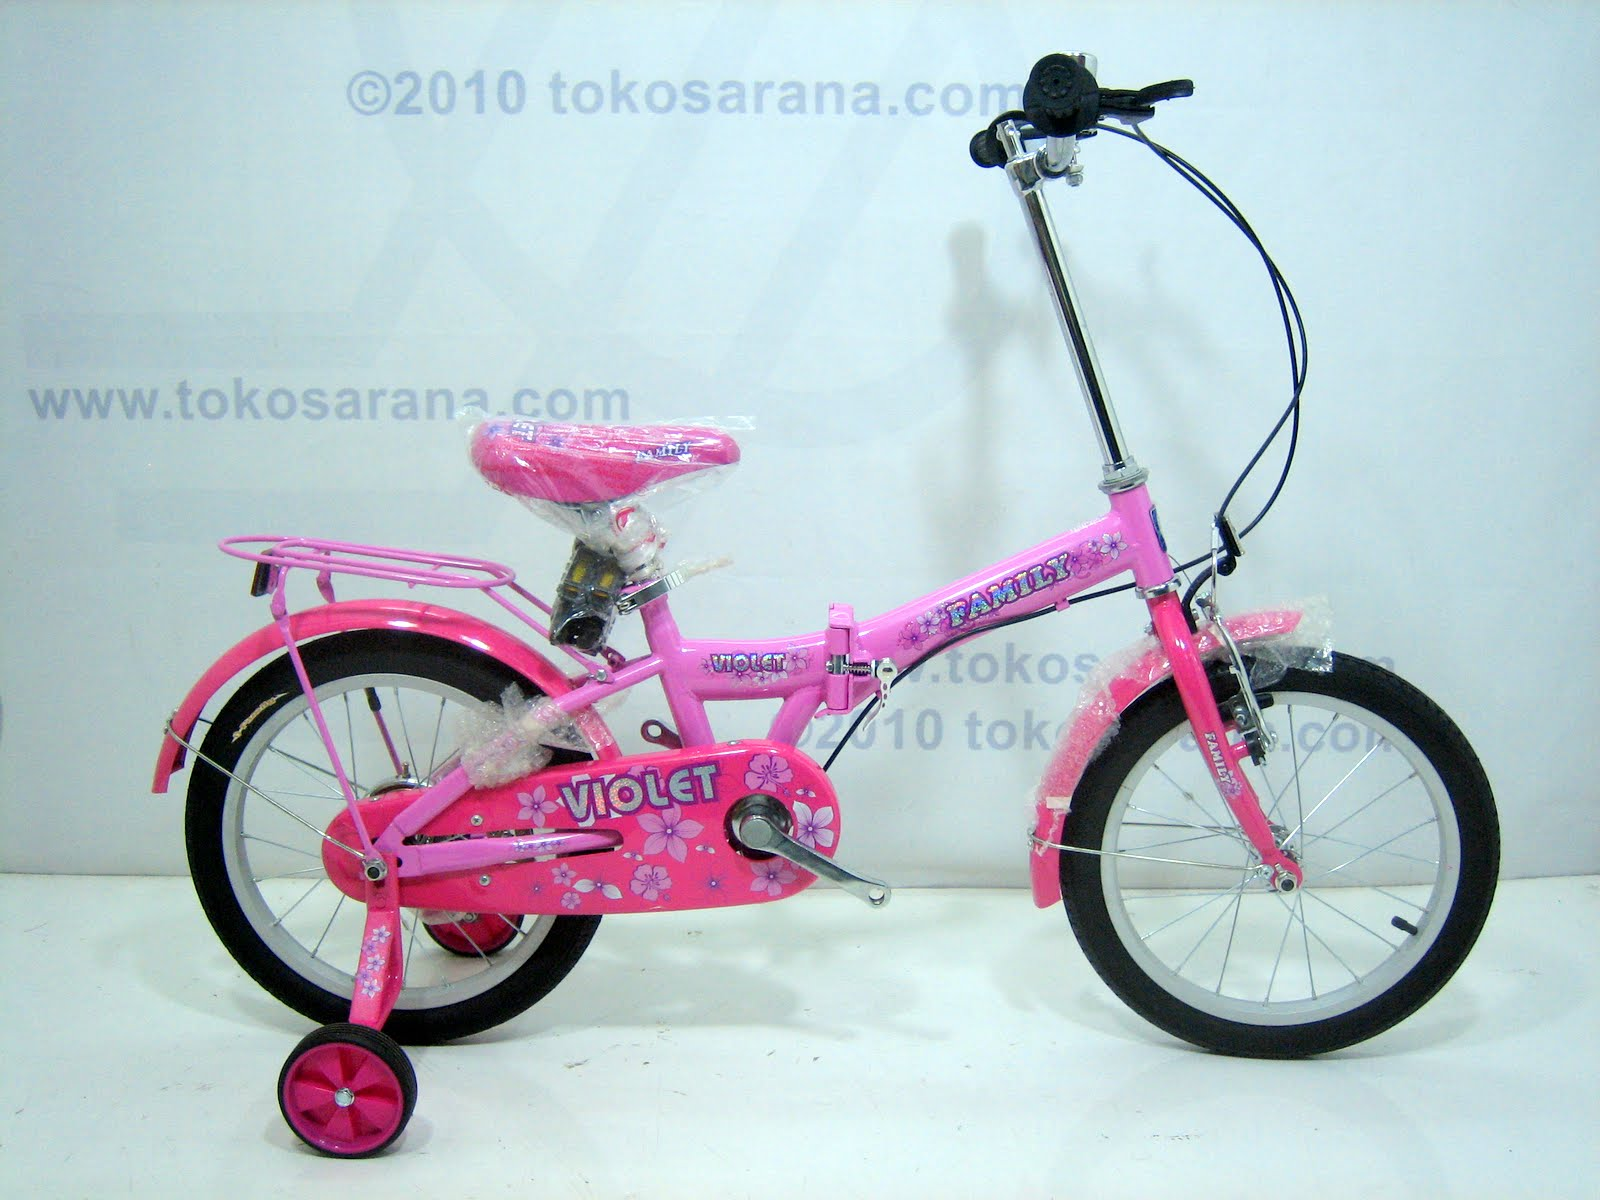 tokomagenta: A Showcase of Products: Sepeda Lipat Anak